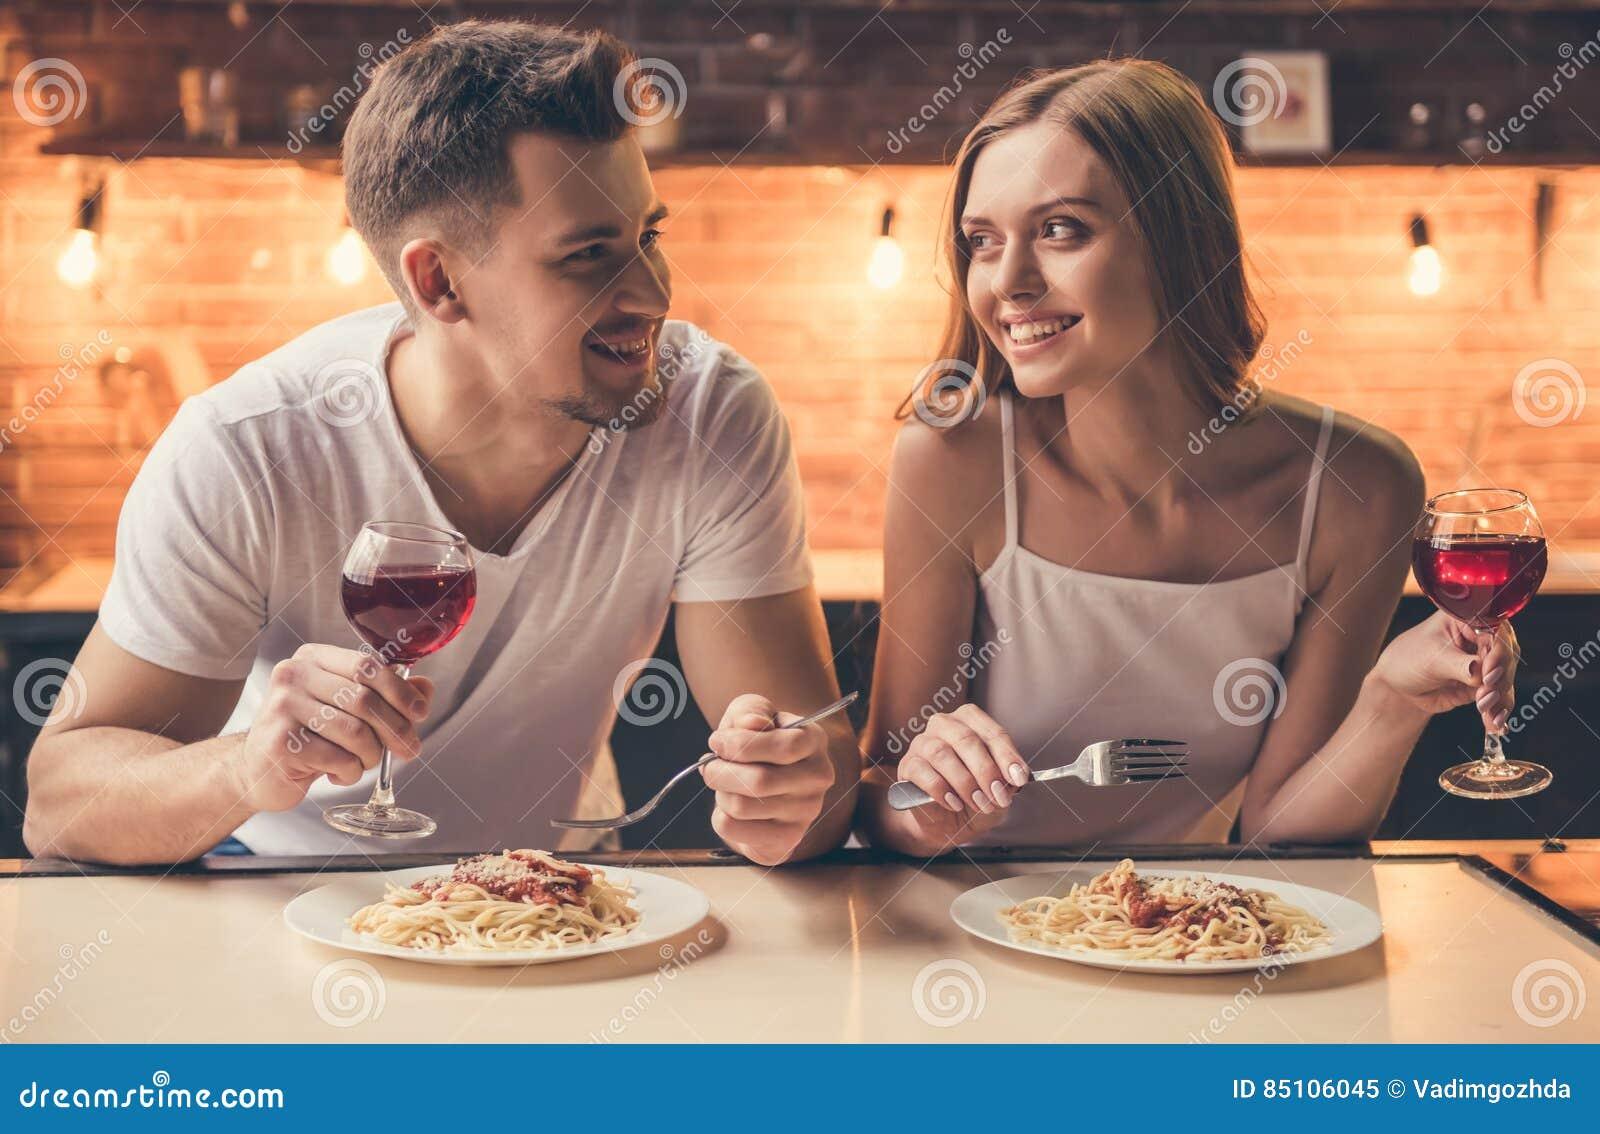 Couple having romantic dinner